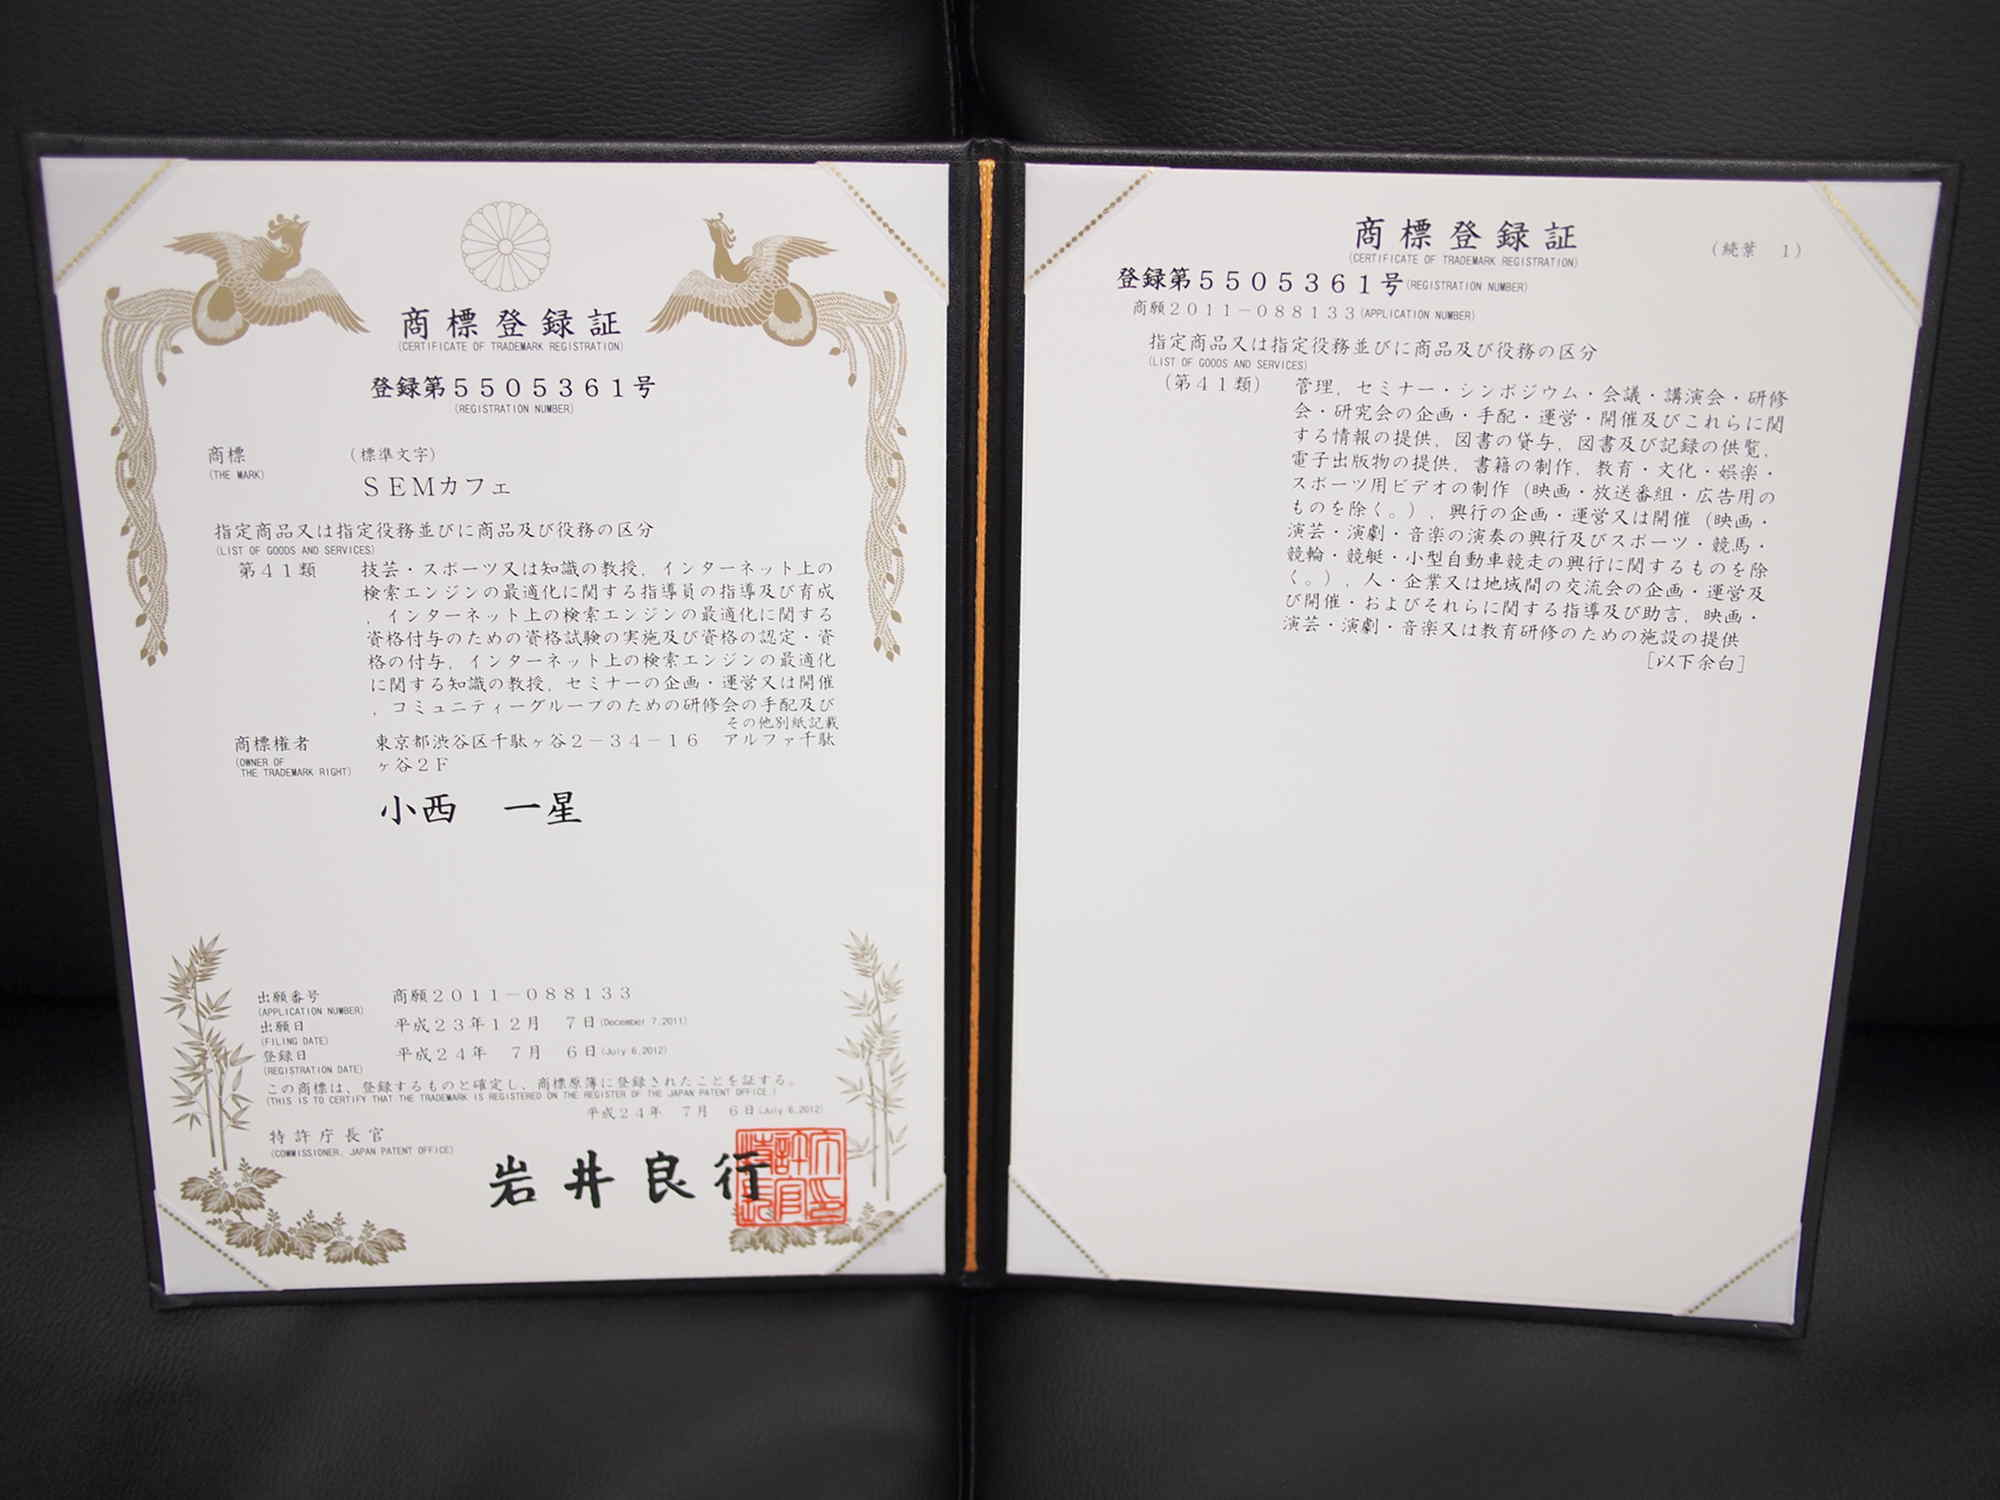 SEMカフェ商標登録証書